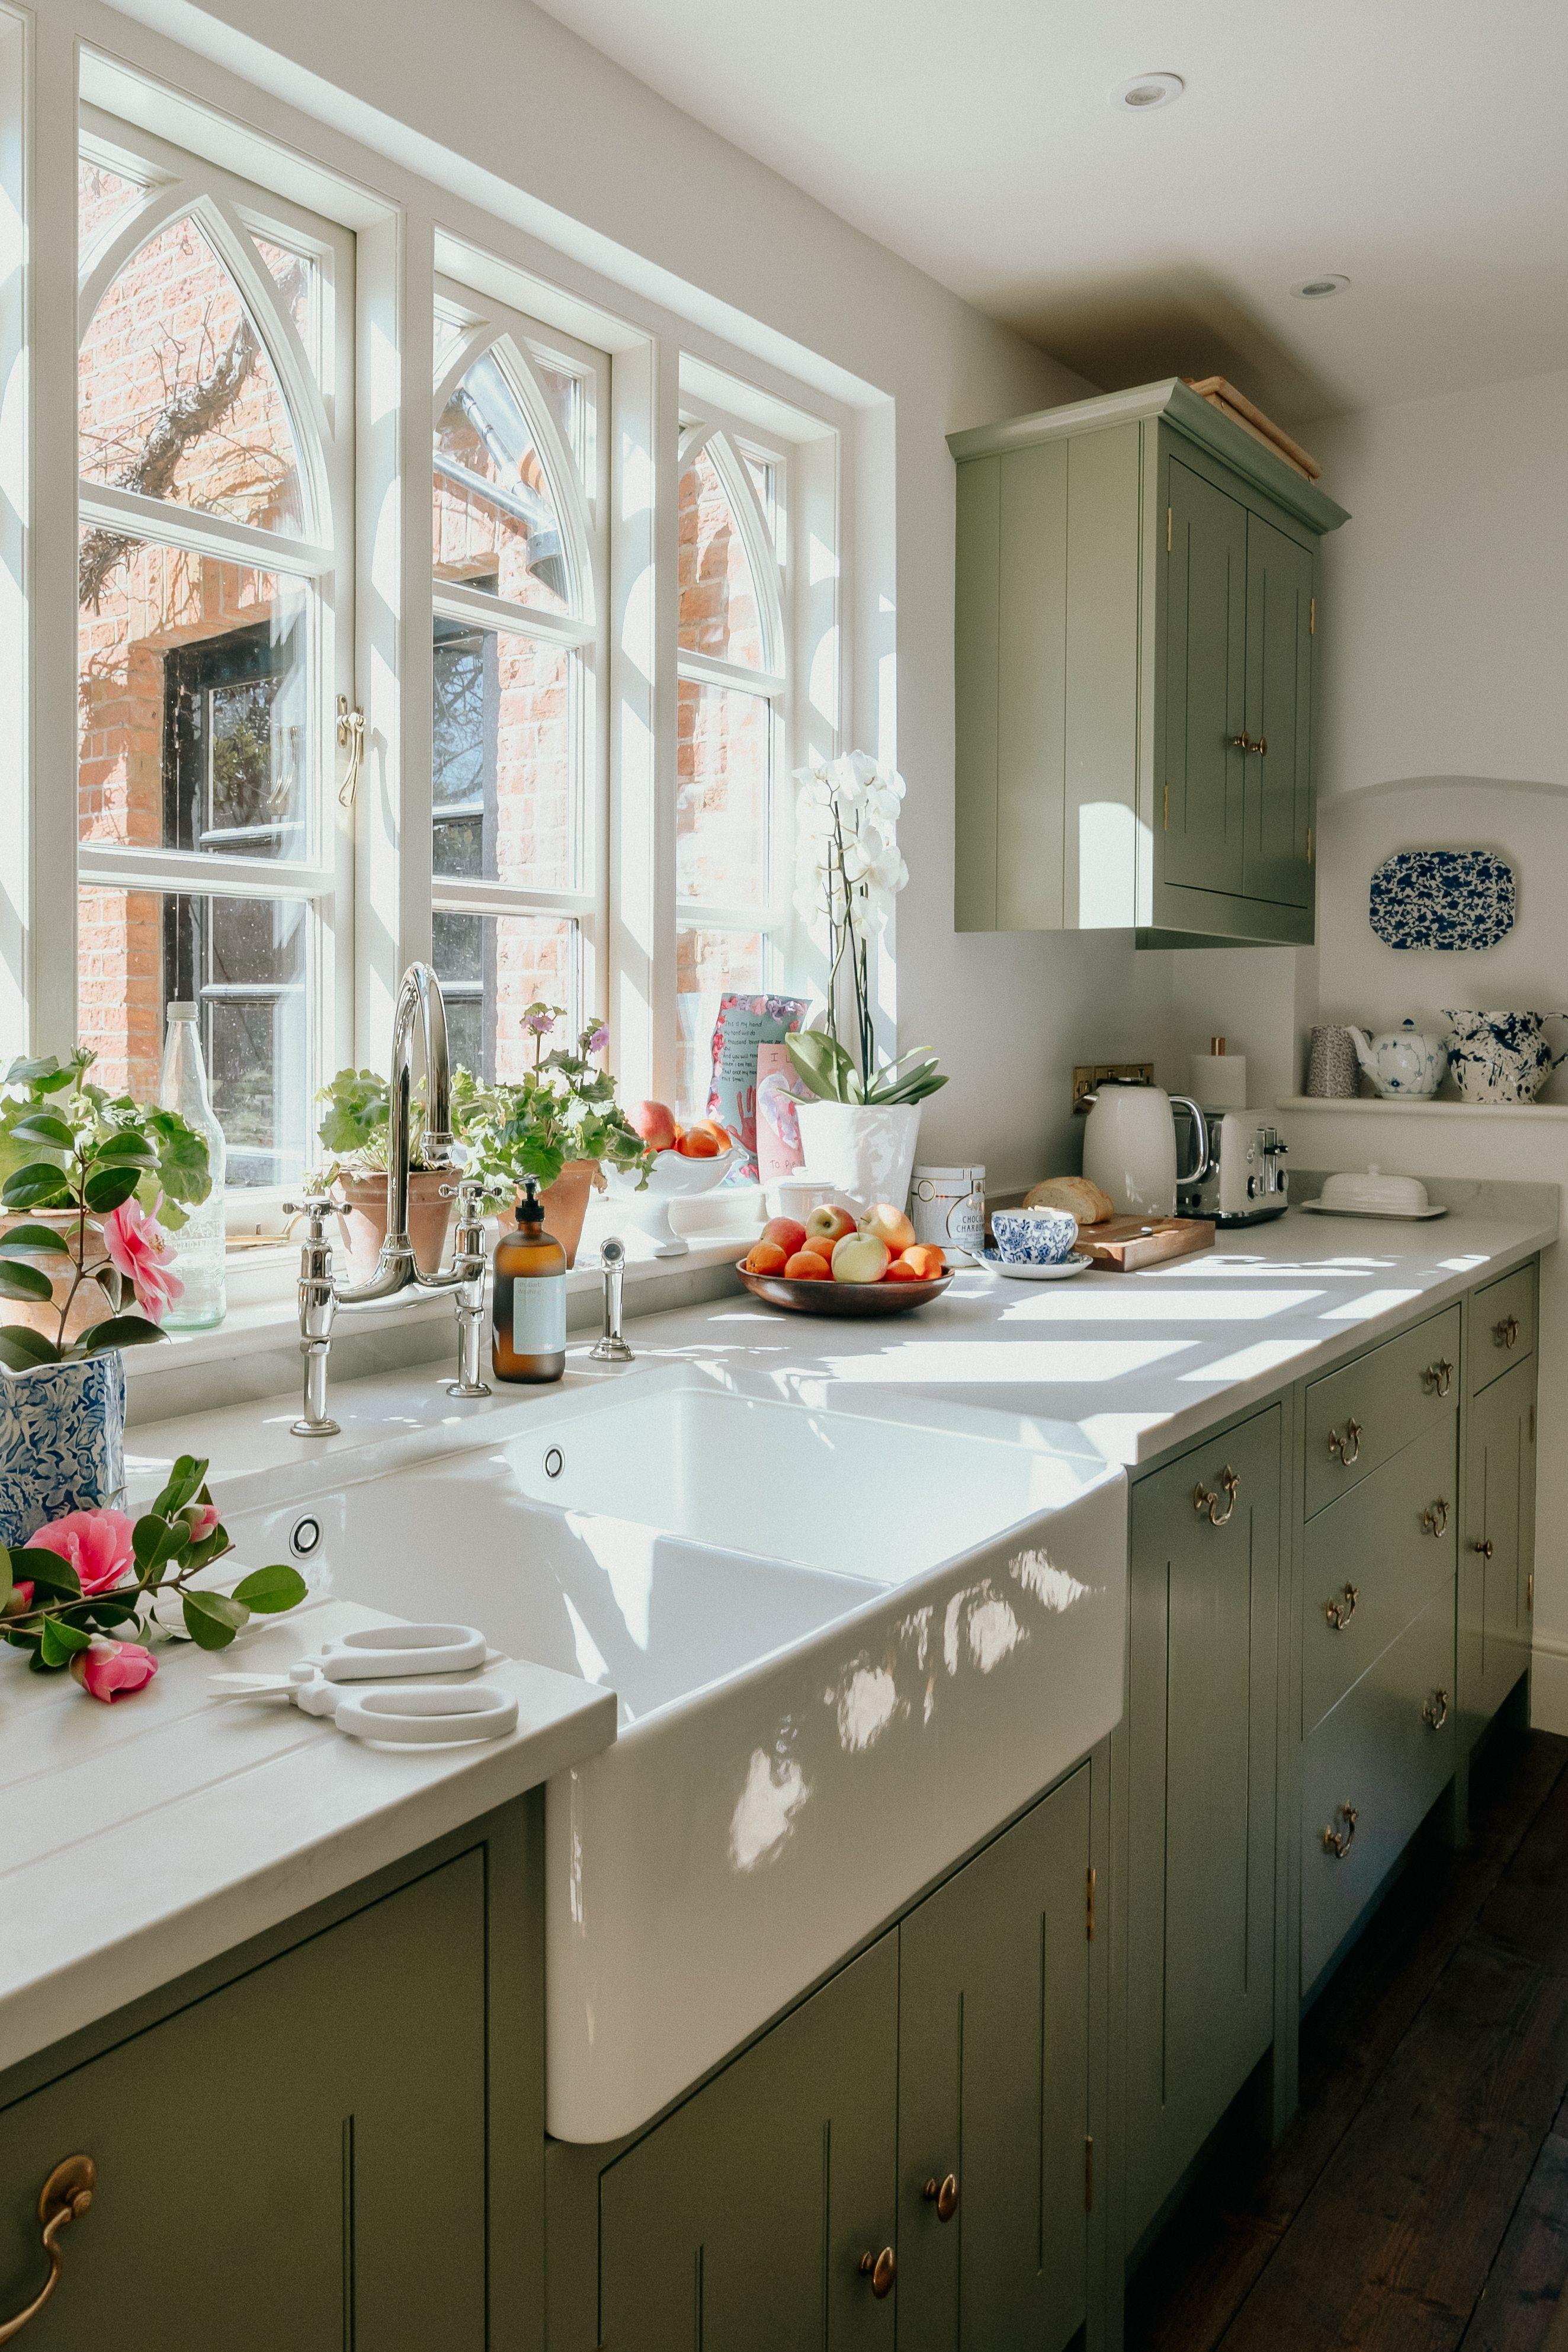 Top kitchen trends to emerge from coronavirus lockdowns